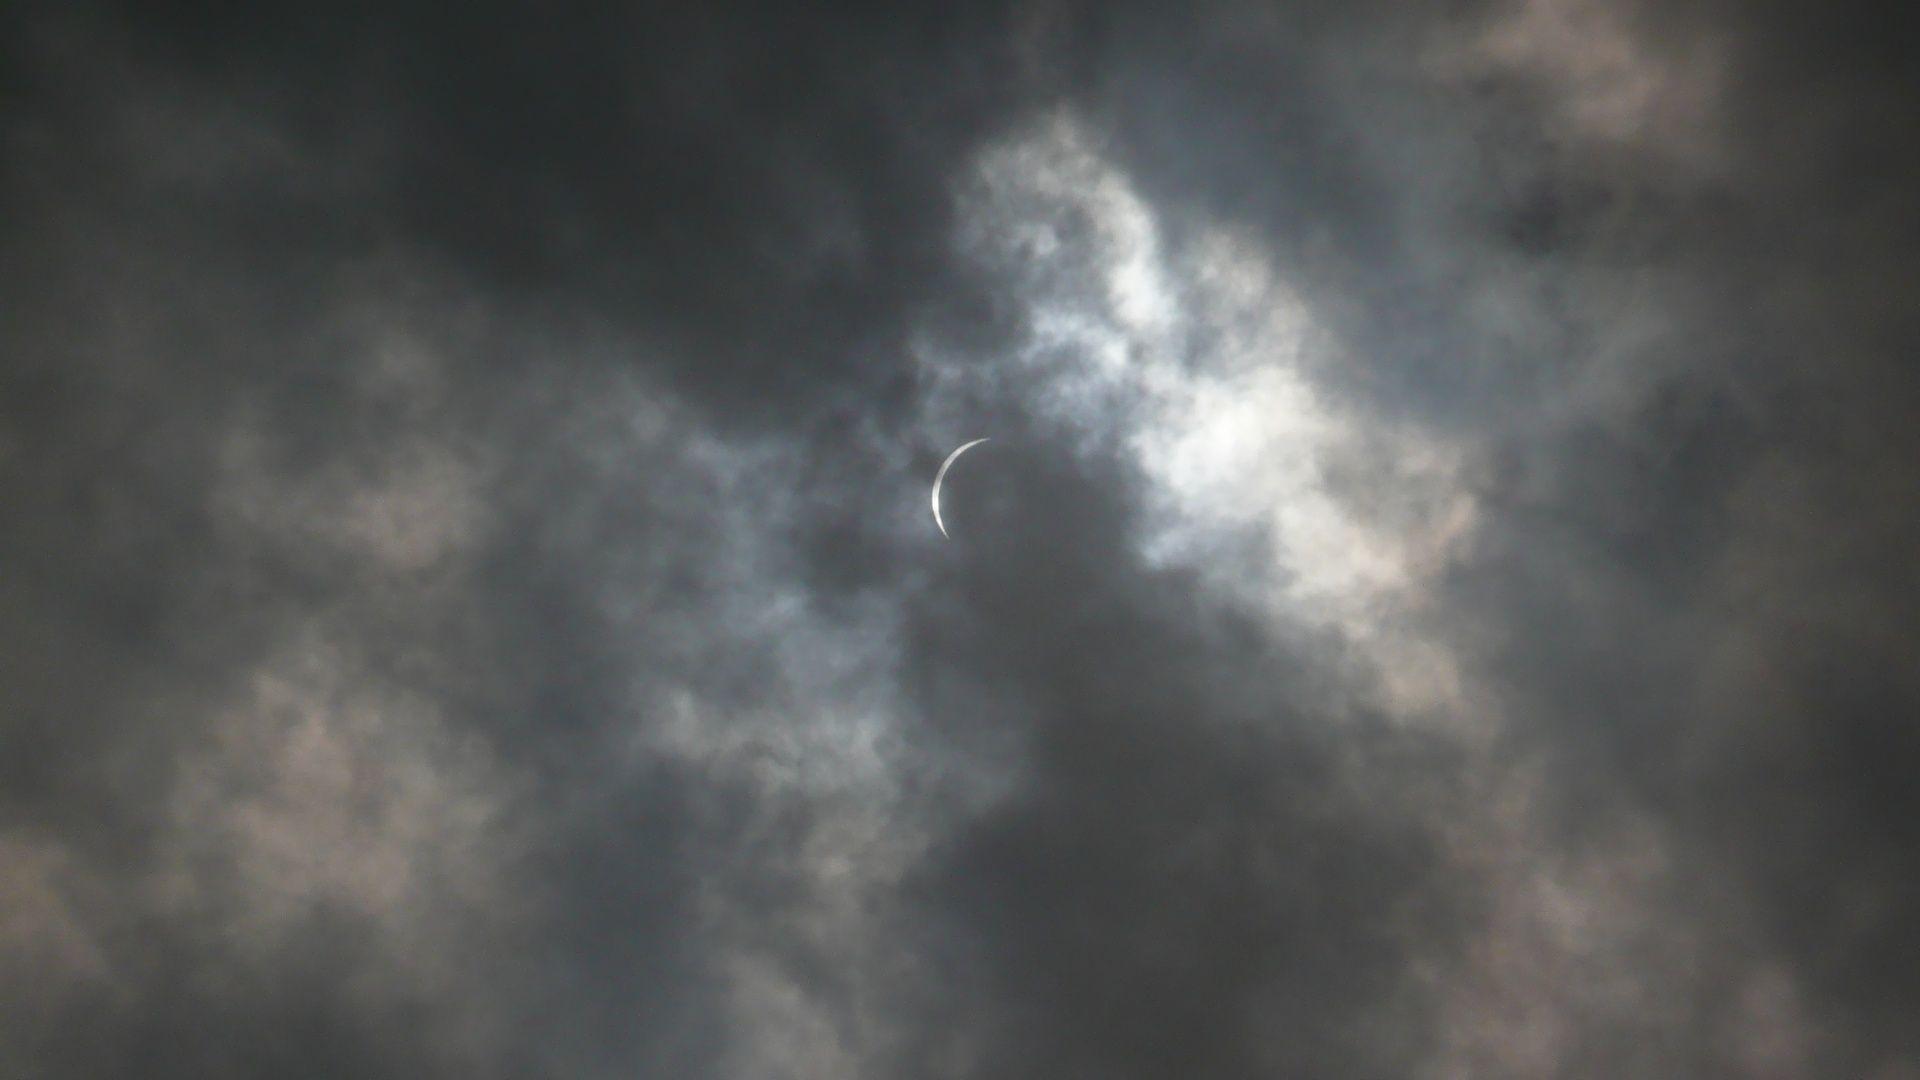 Partial solar eclipse seen at Miyazaki, Japan